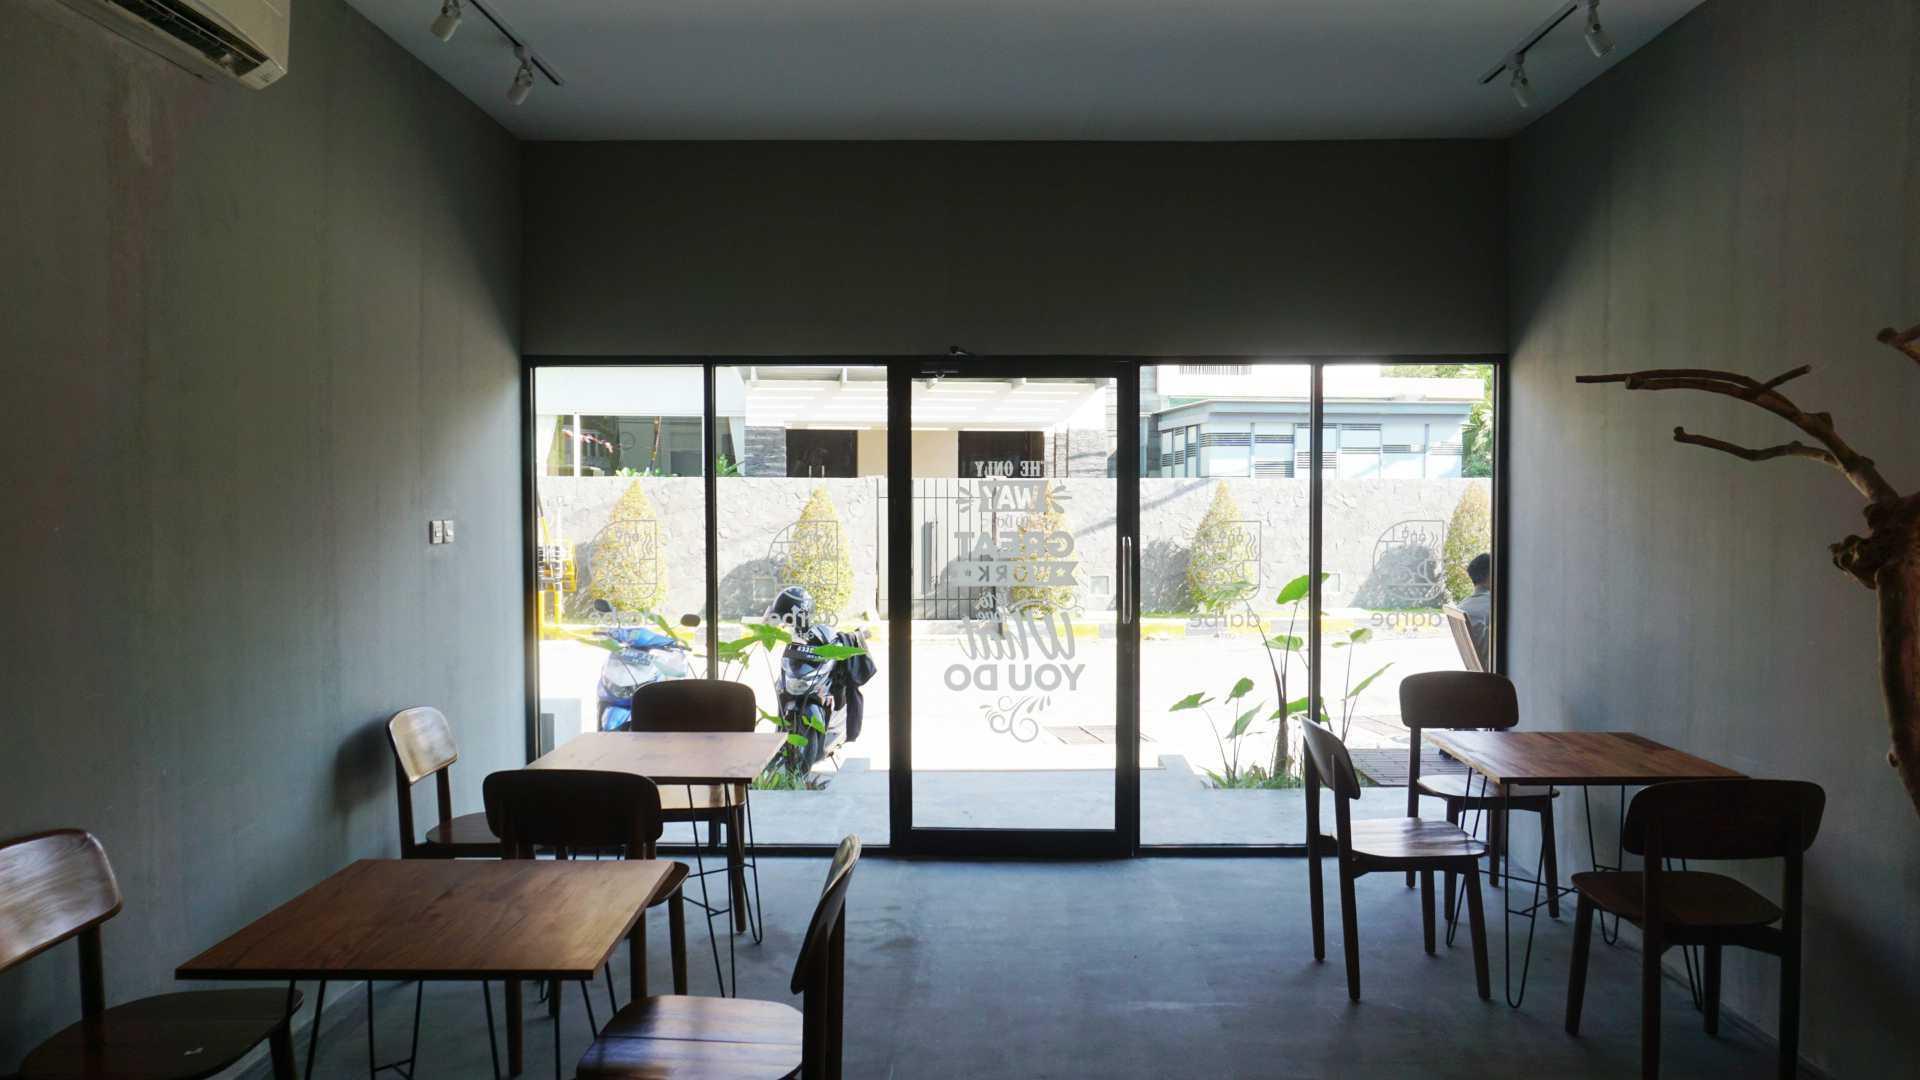 Sekala Darbe Cafe & Office, Surabaya Surabaya, Kota Sby, Jawa Timur, Indonesia Surabaya, Kota Sby, Jawa Timur, Indonesia Sekala-Drabe-Cafe-Office  97783